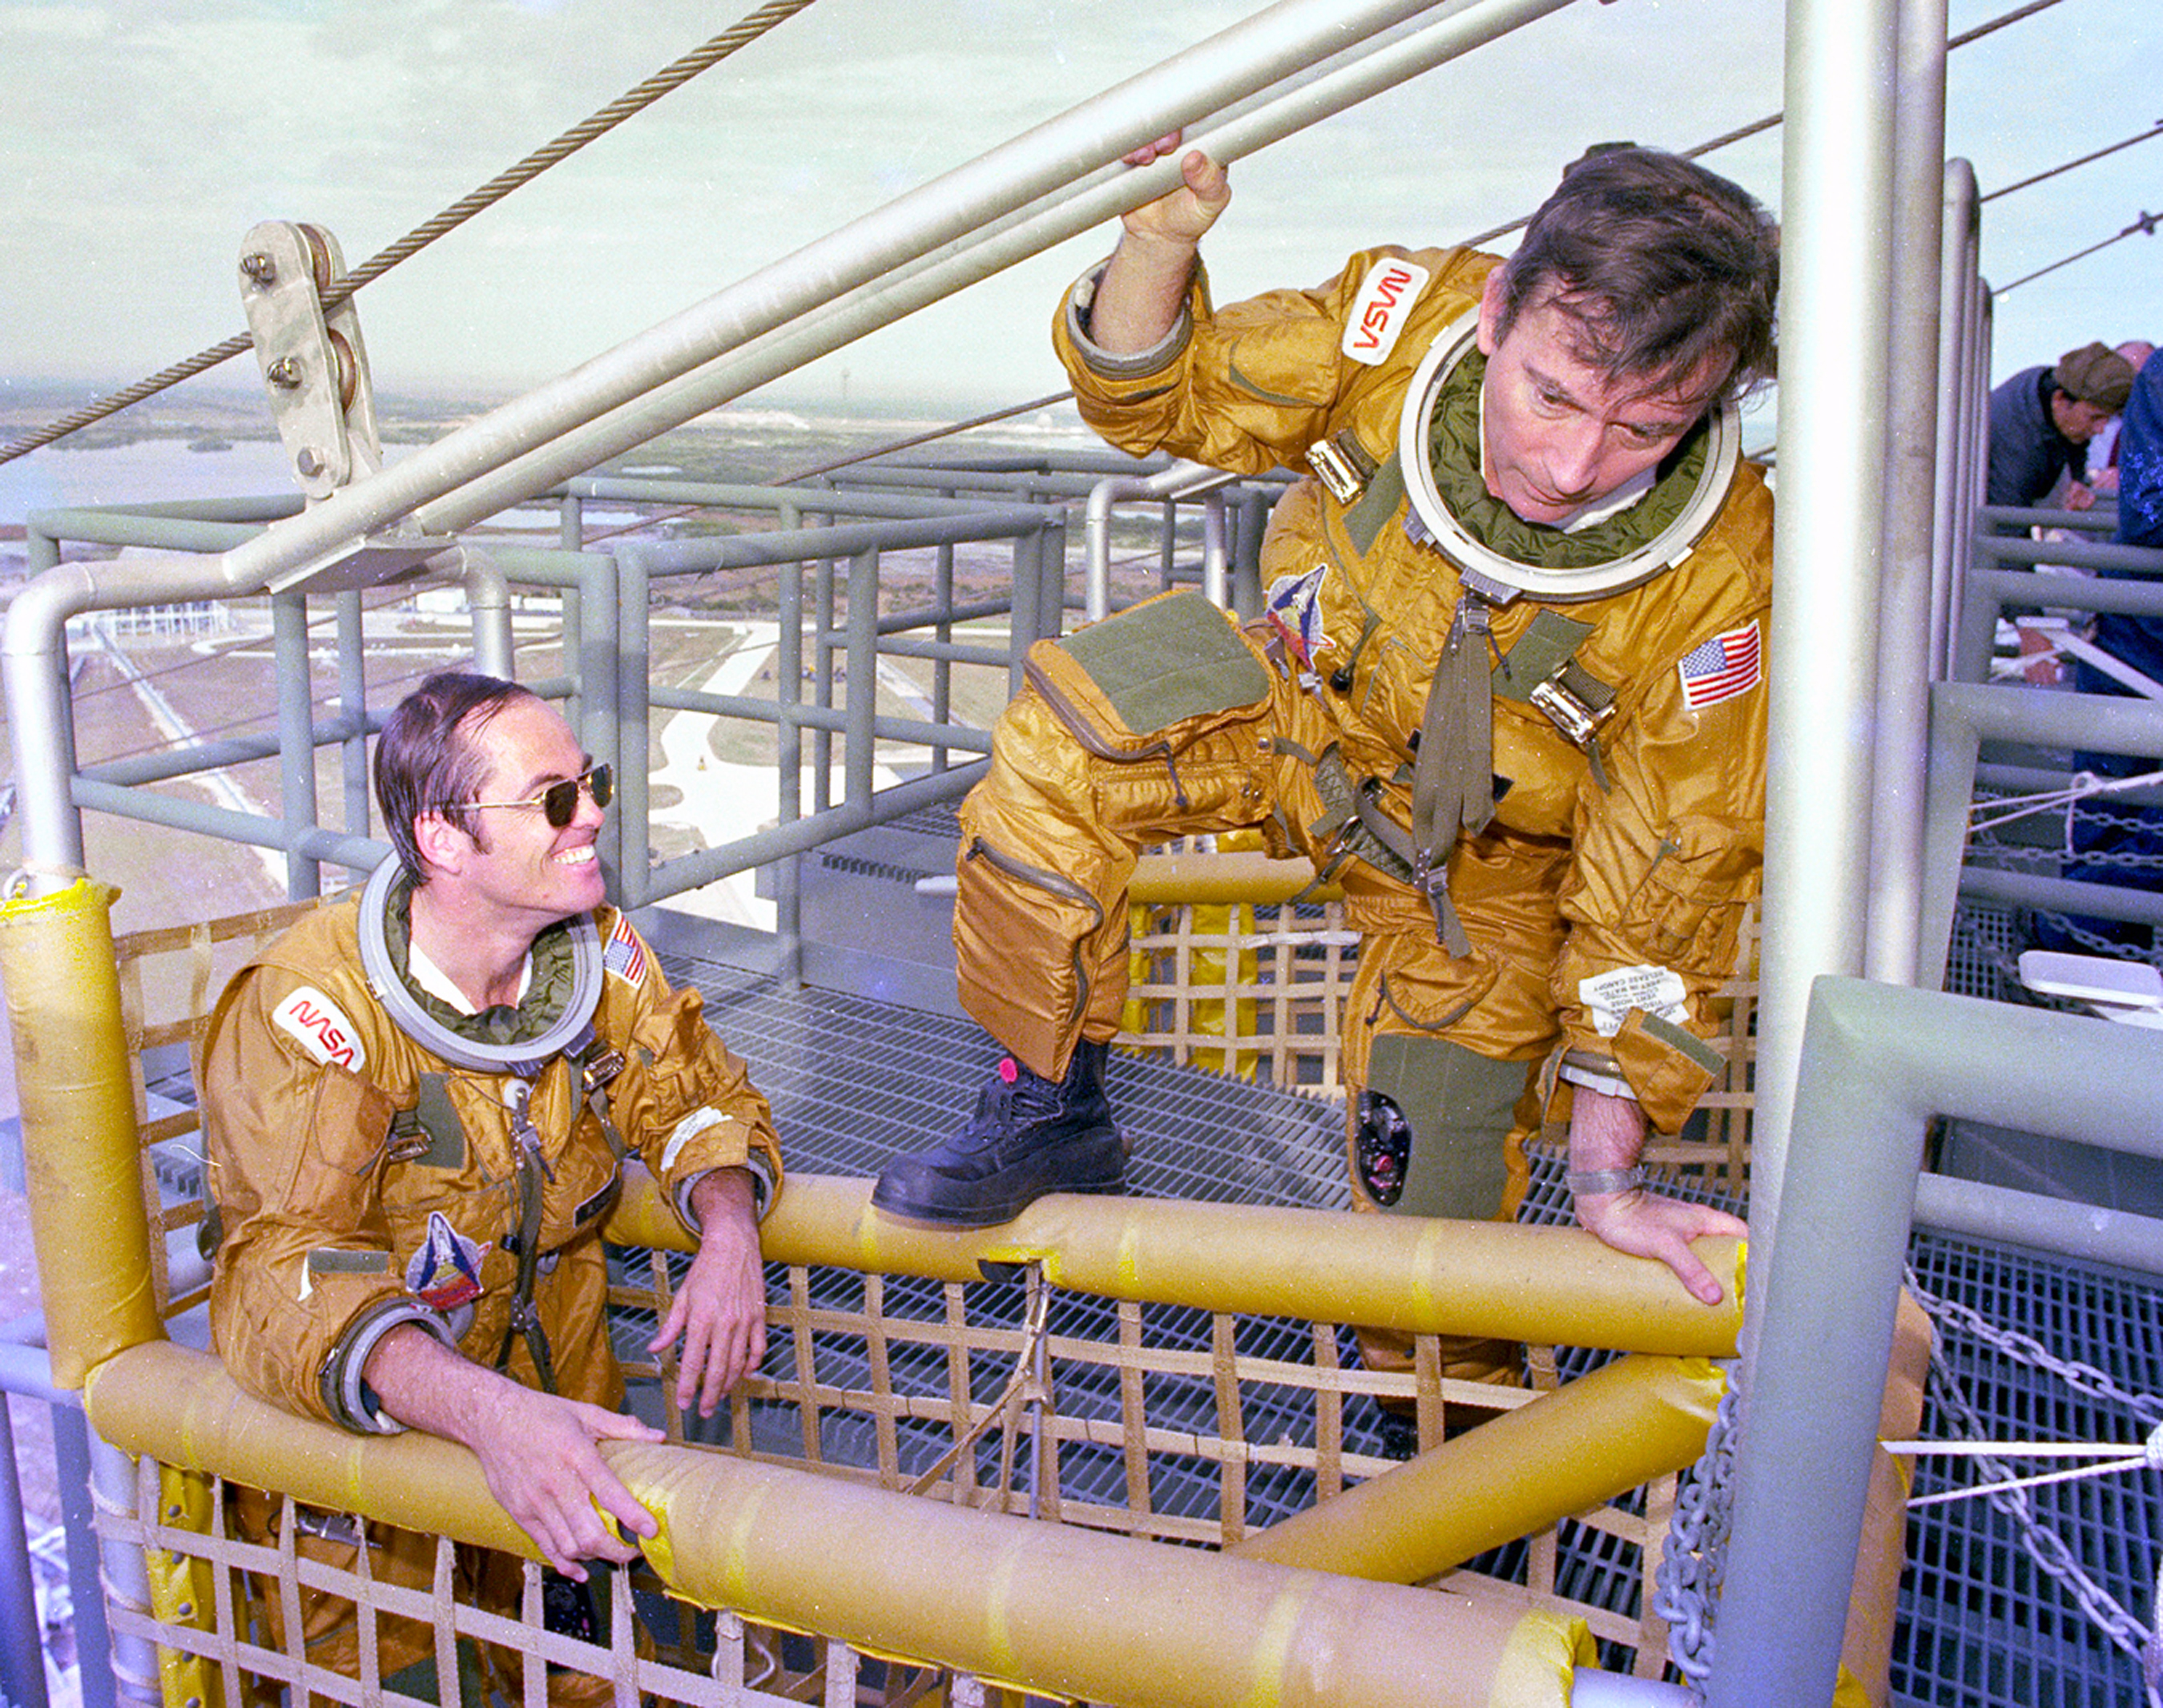 Nasa 1980s All Eyes Focus On Space Shuttle